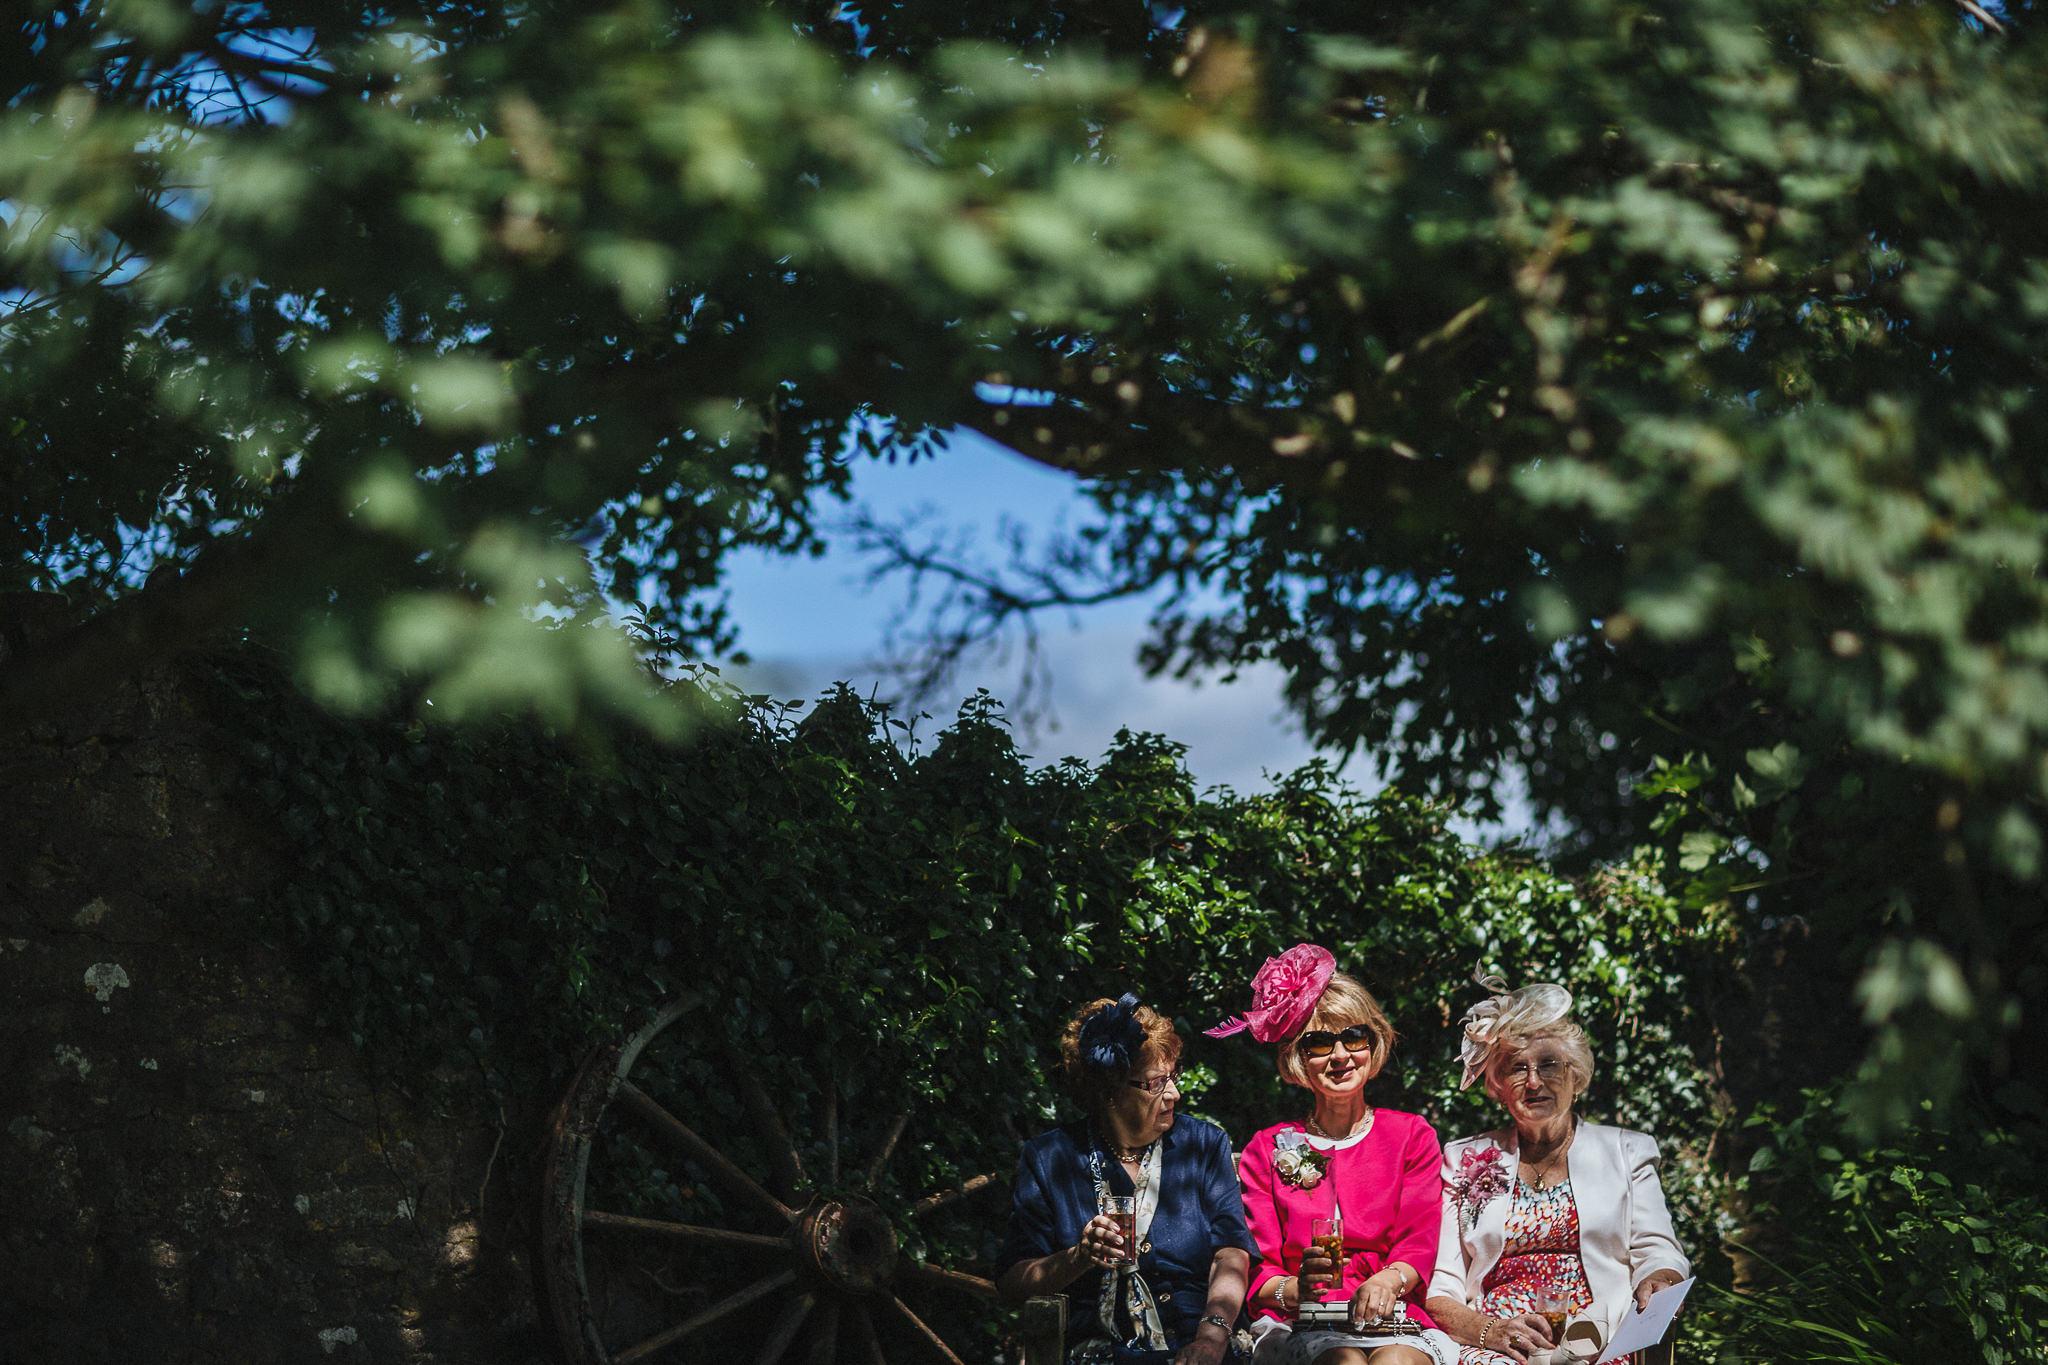 paul-marbrook-Farm-Wedding-Photographer-Lancashire-90044